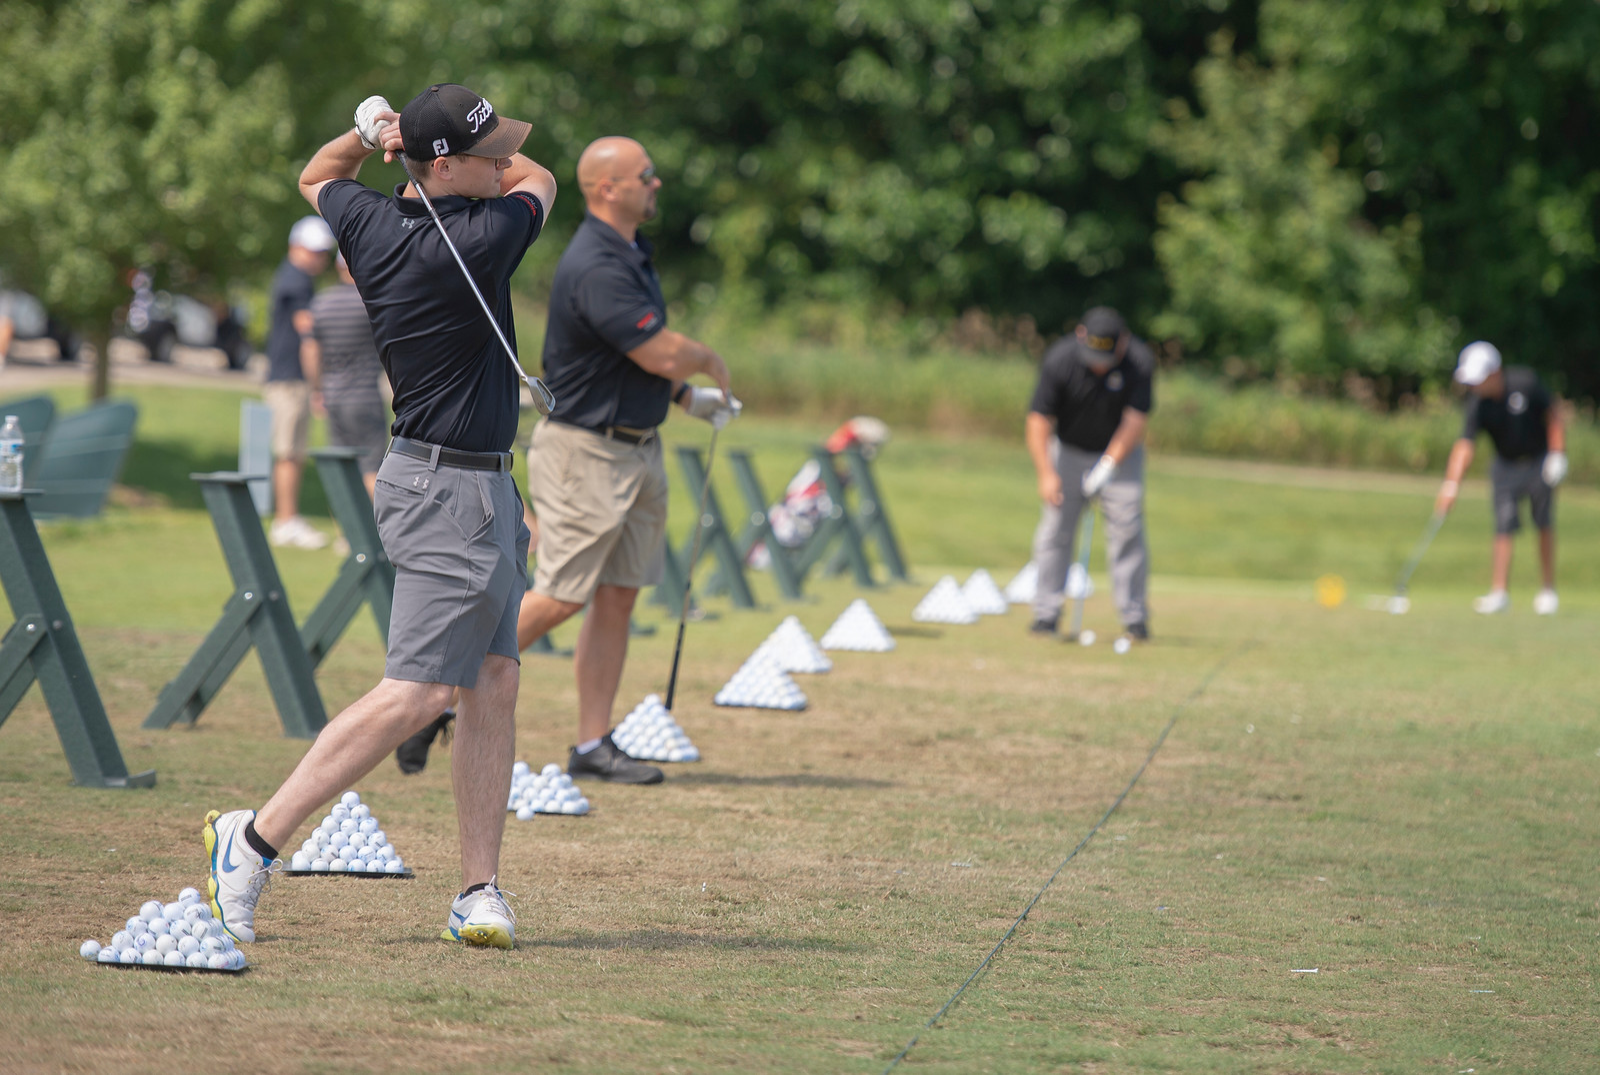 2020_golf_outing_ND40639.jpg